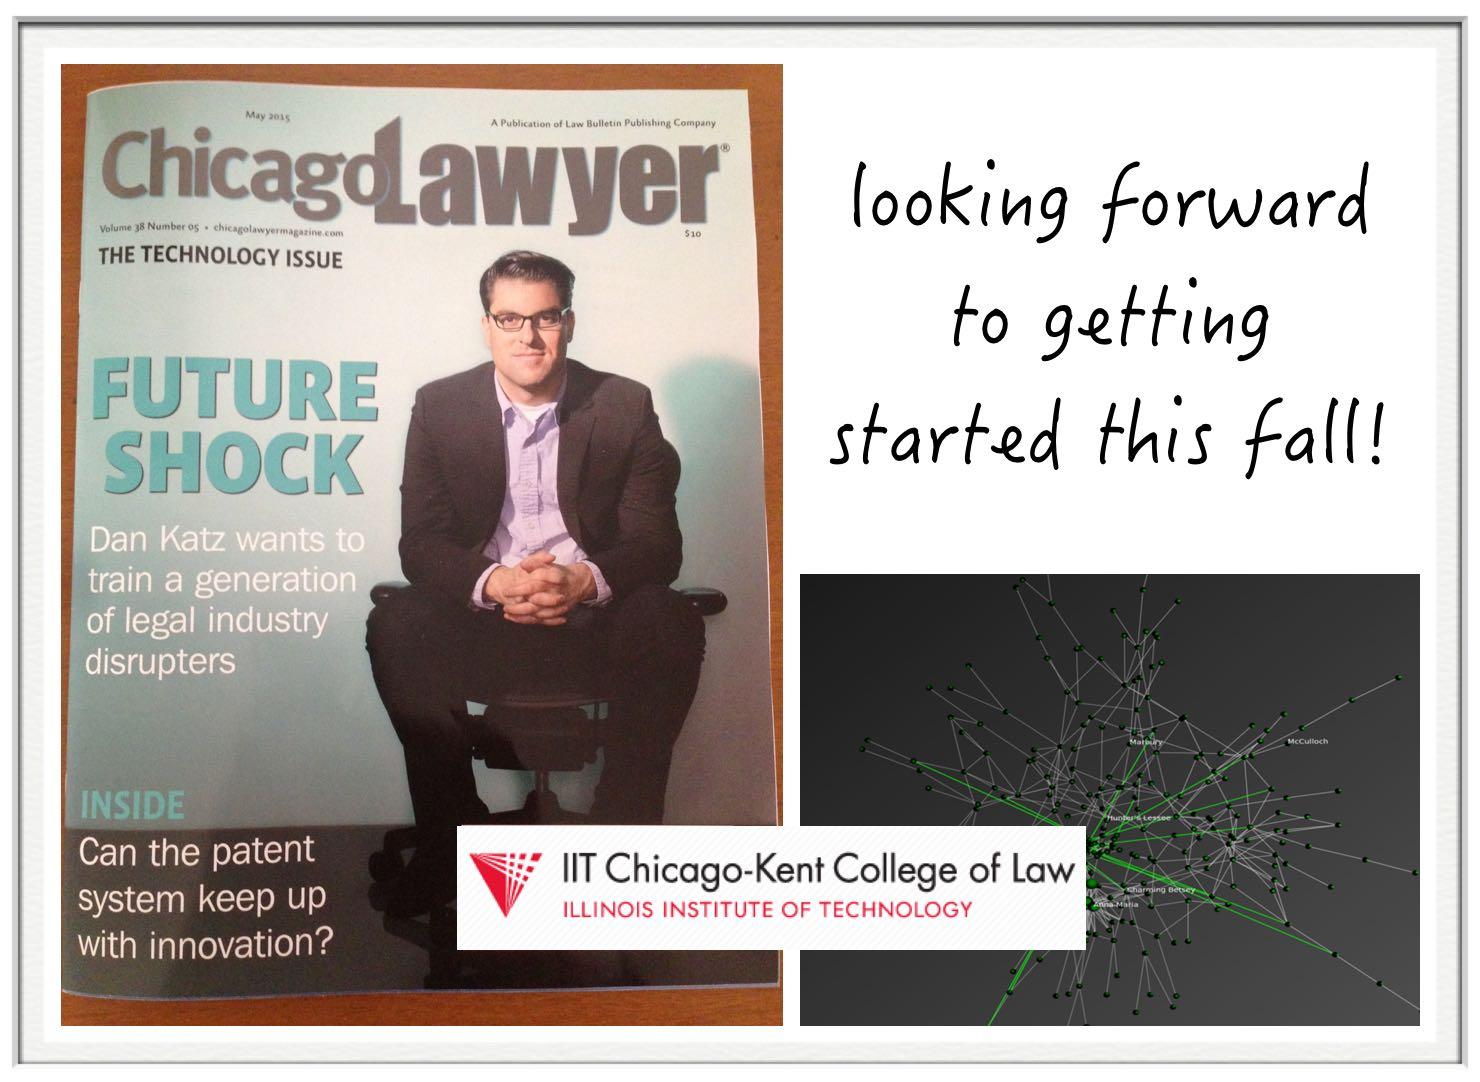 http://www.chicagolawyermagazine.com/Articles/2015/05/Dan-Katz-IIT-Chicago-Kent.aspx